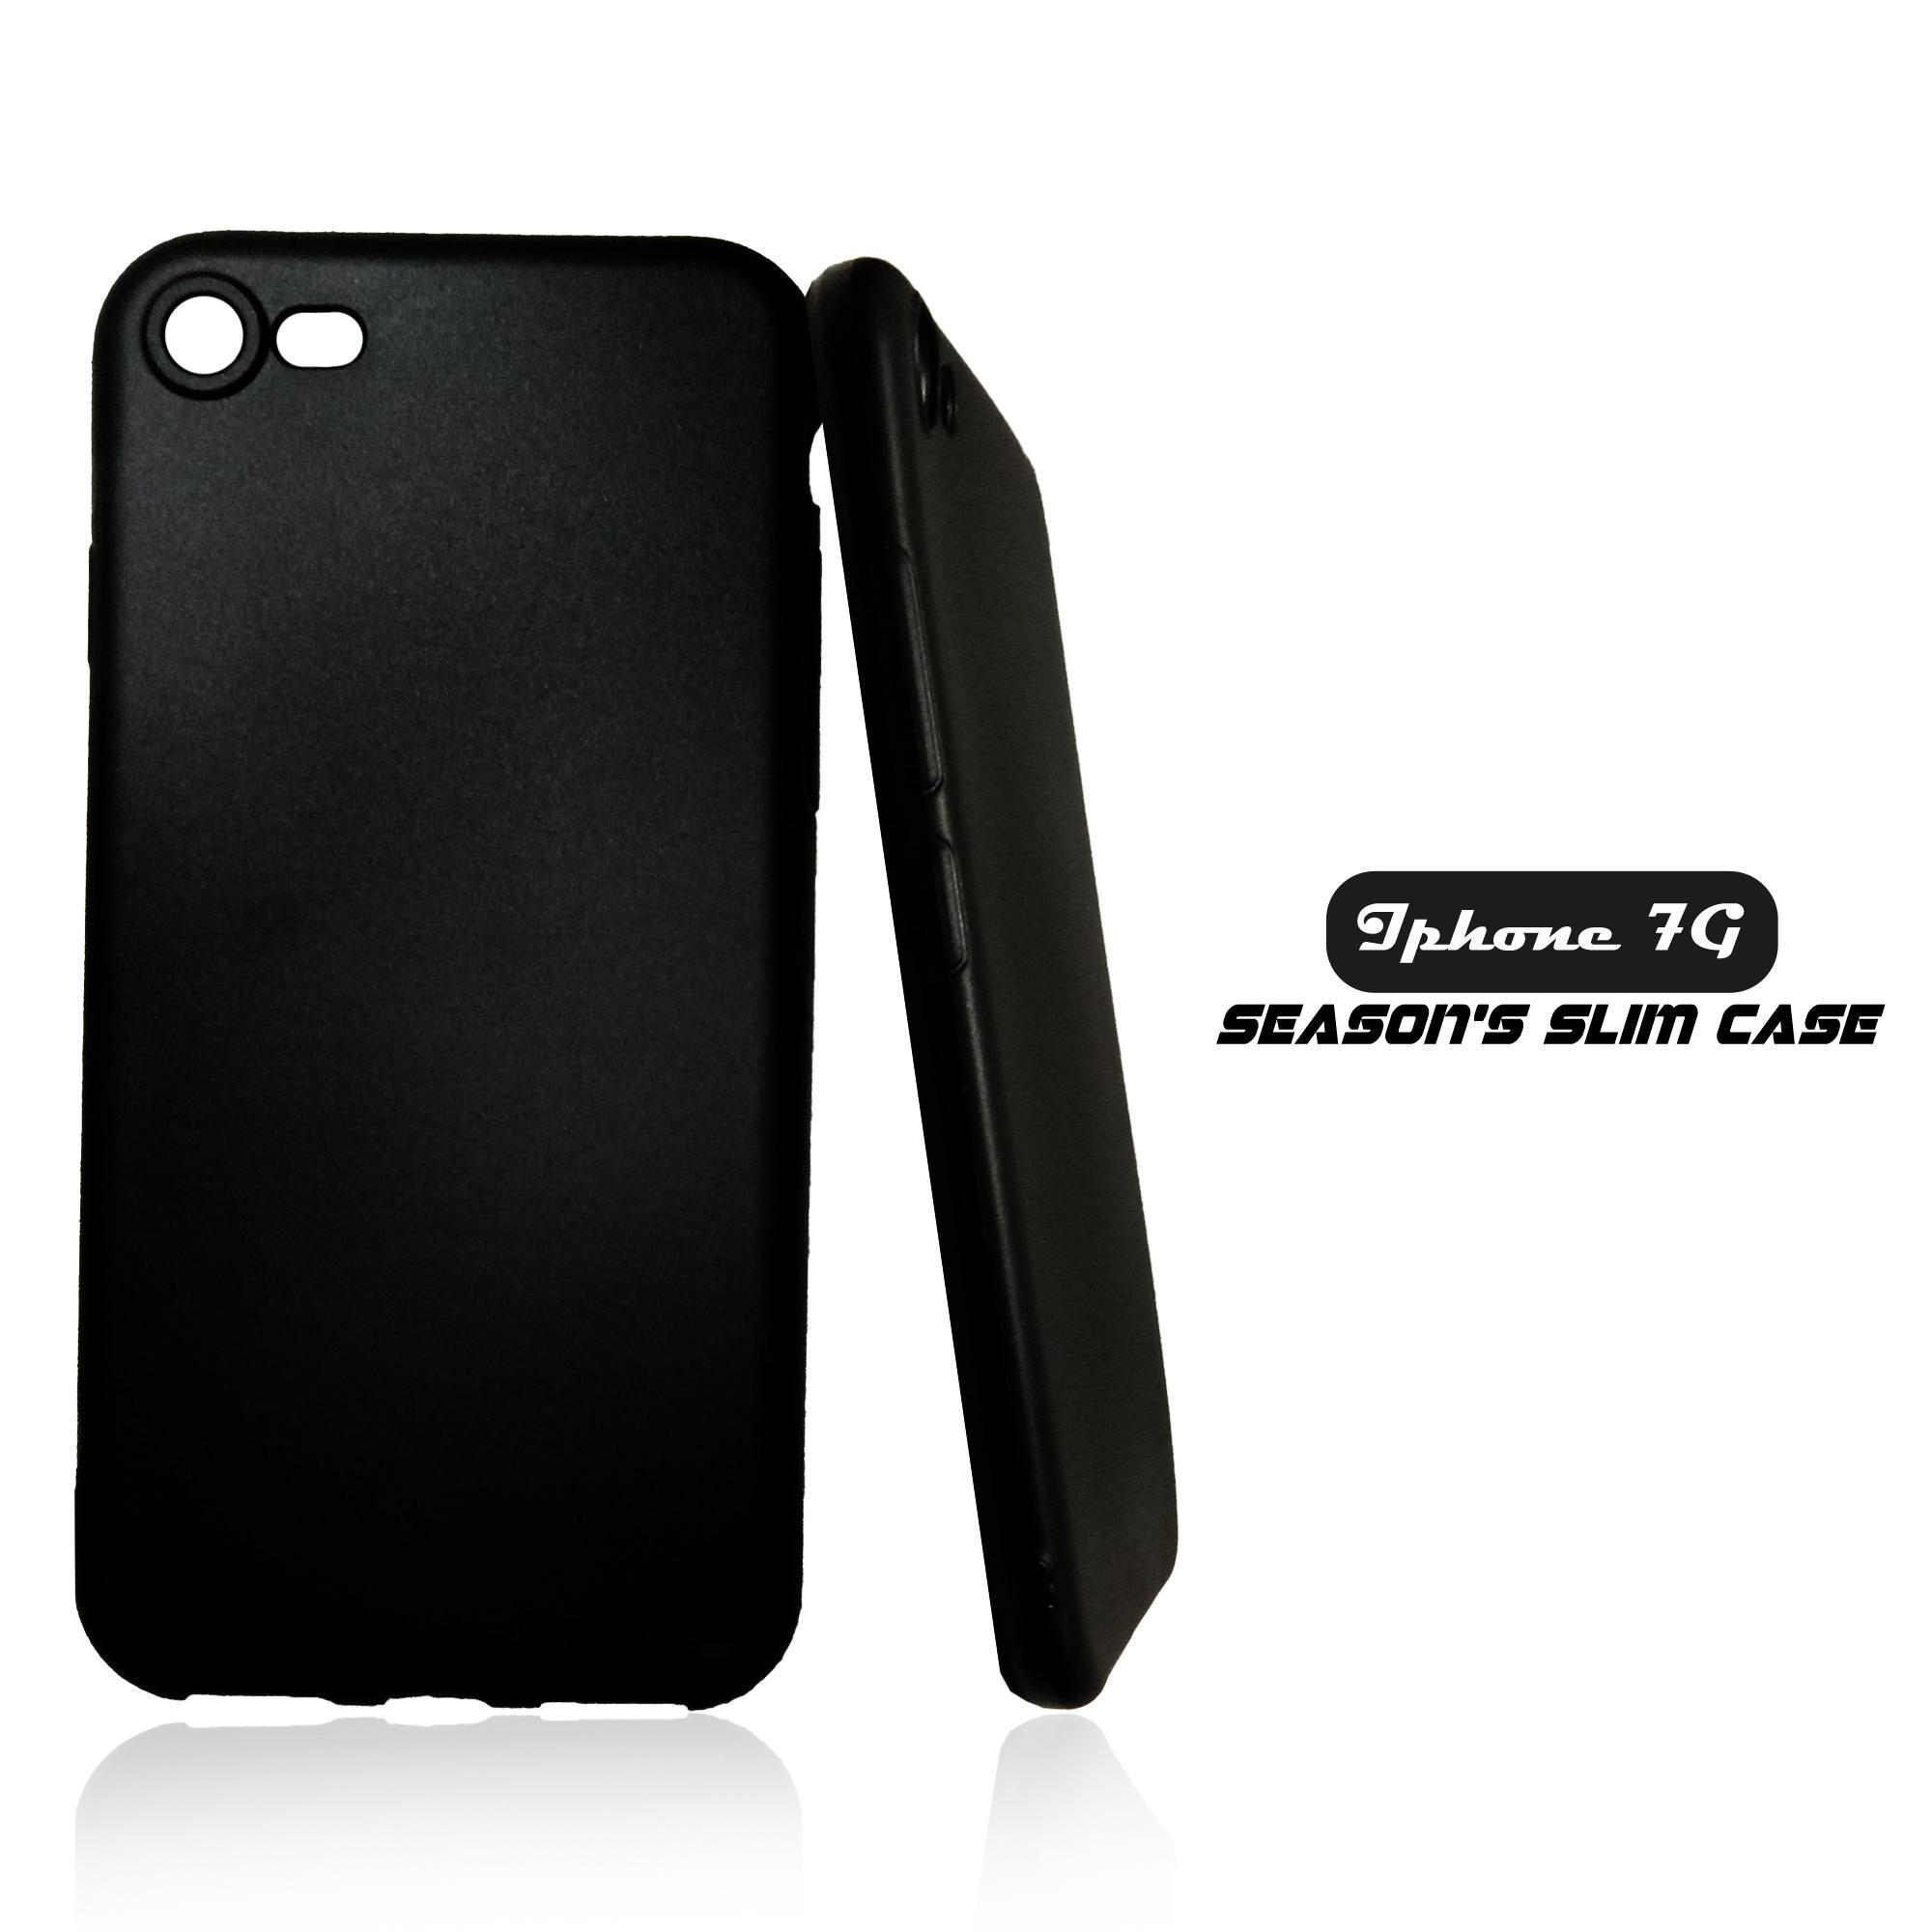 Joyce Slim Matte Black for Iphone 7G Softcase Baby Skin